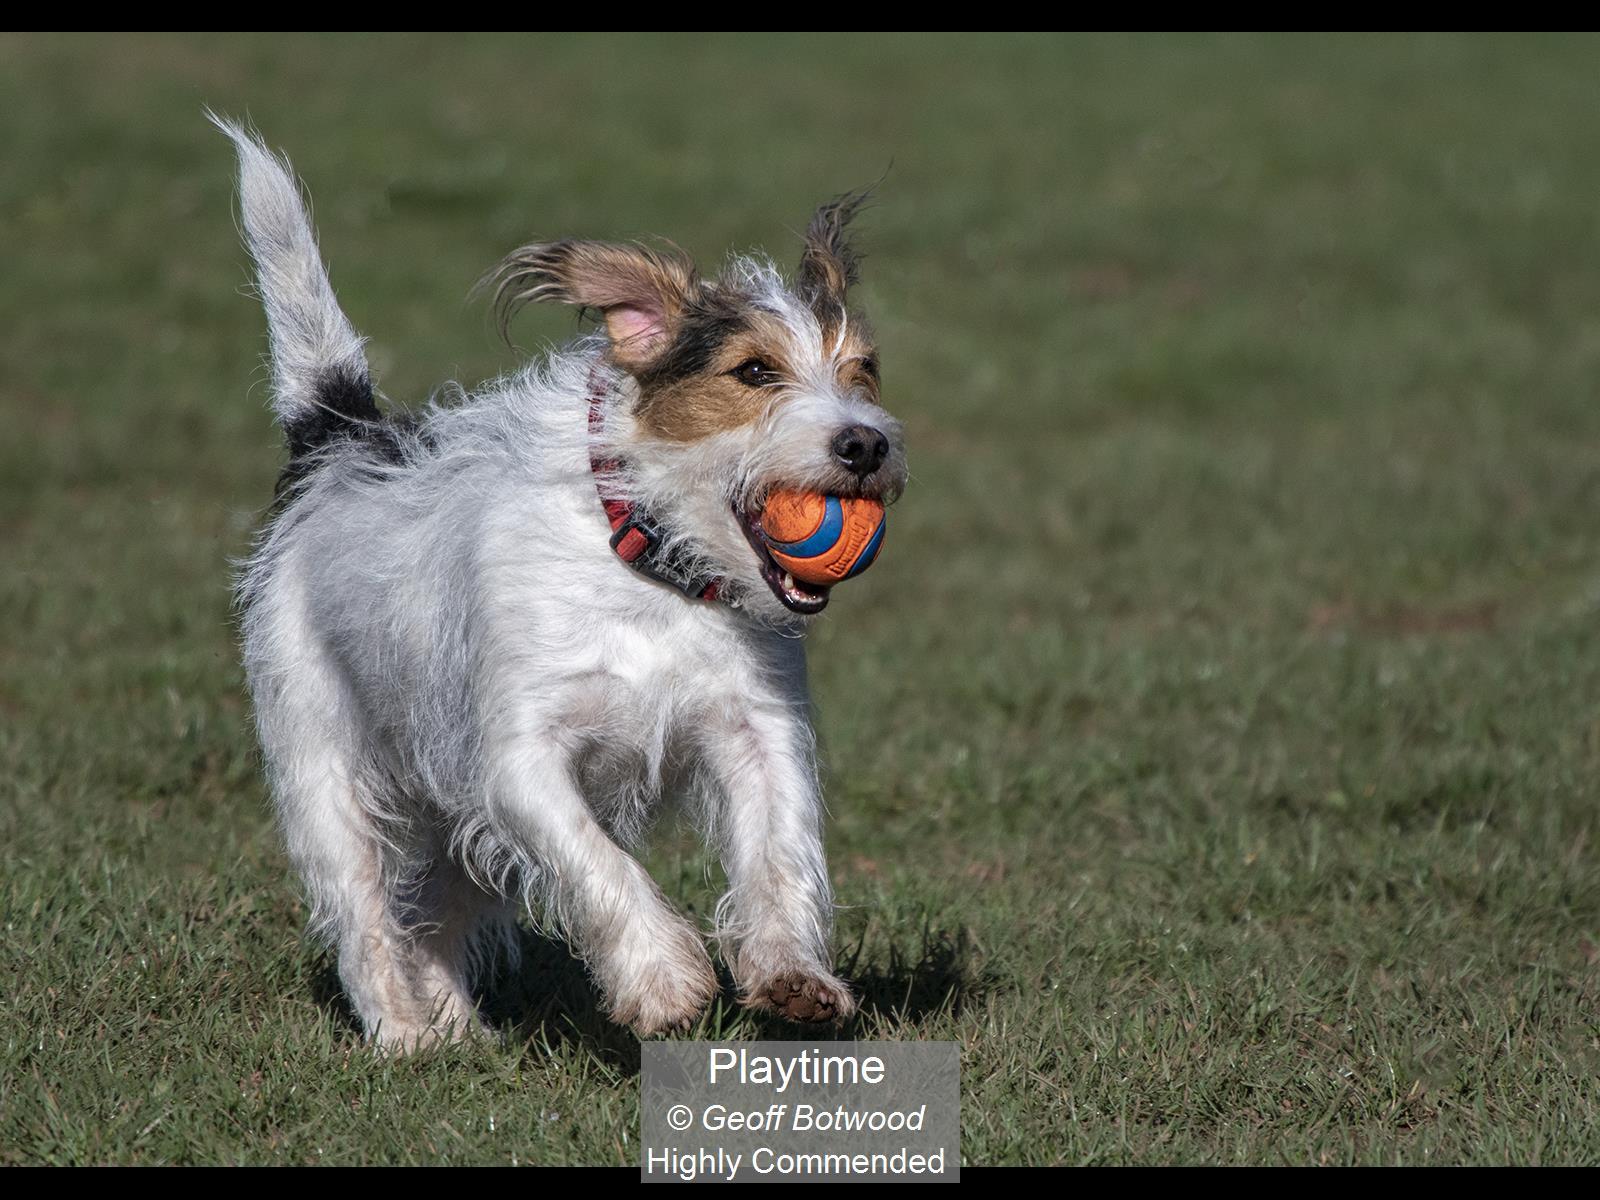 Playtime_Geoff Botwood_HComm